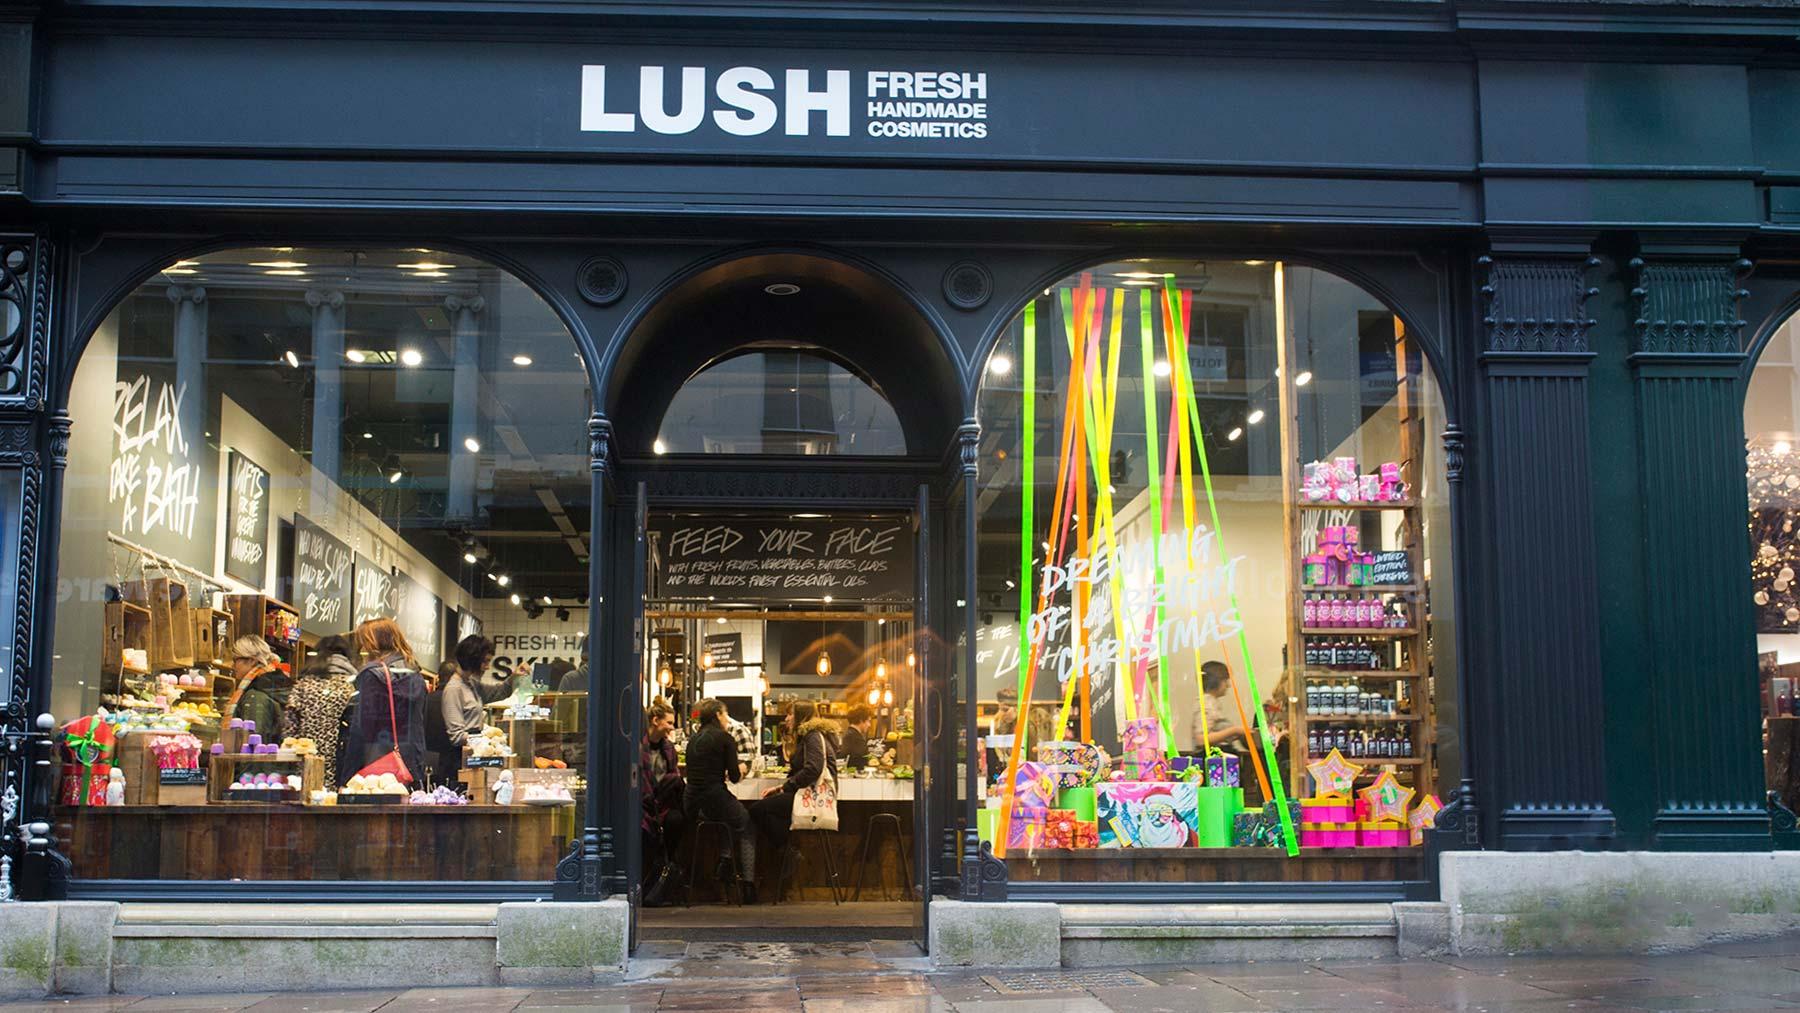 Ginger | Perfume | Lush Fresh Handmade